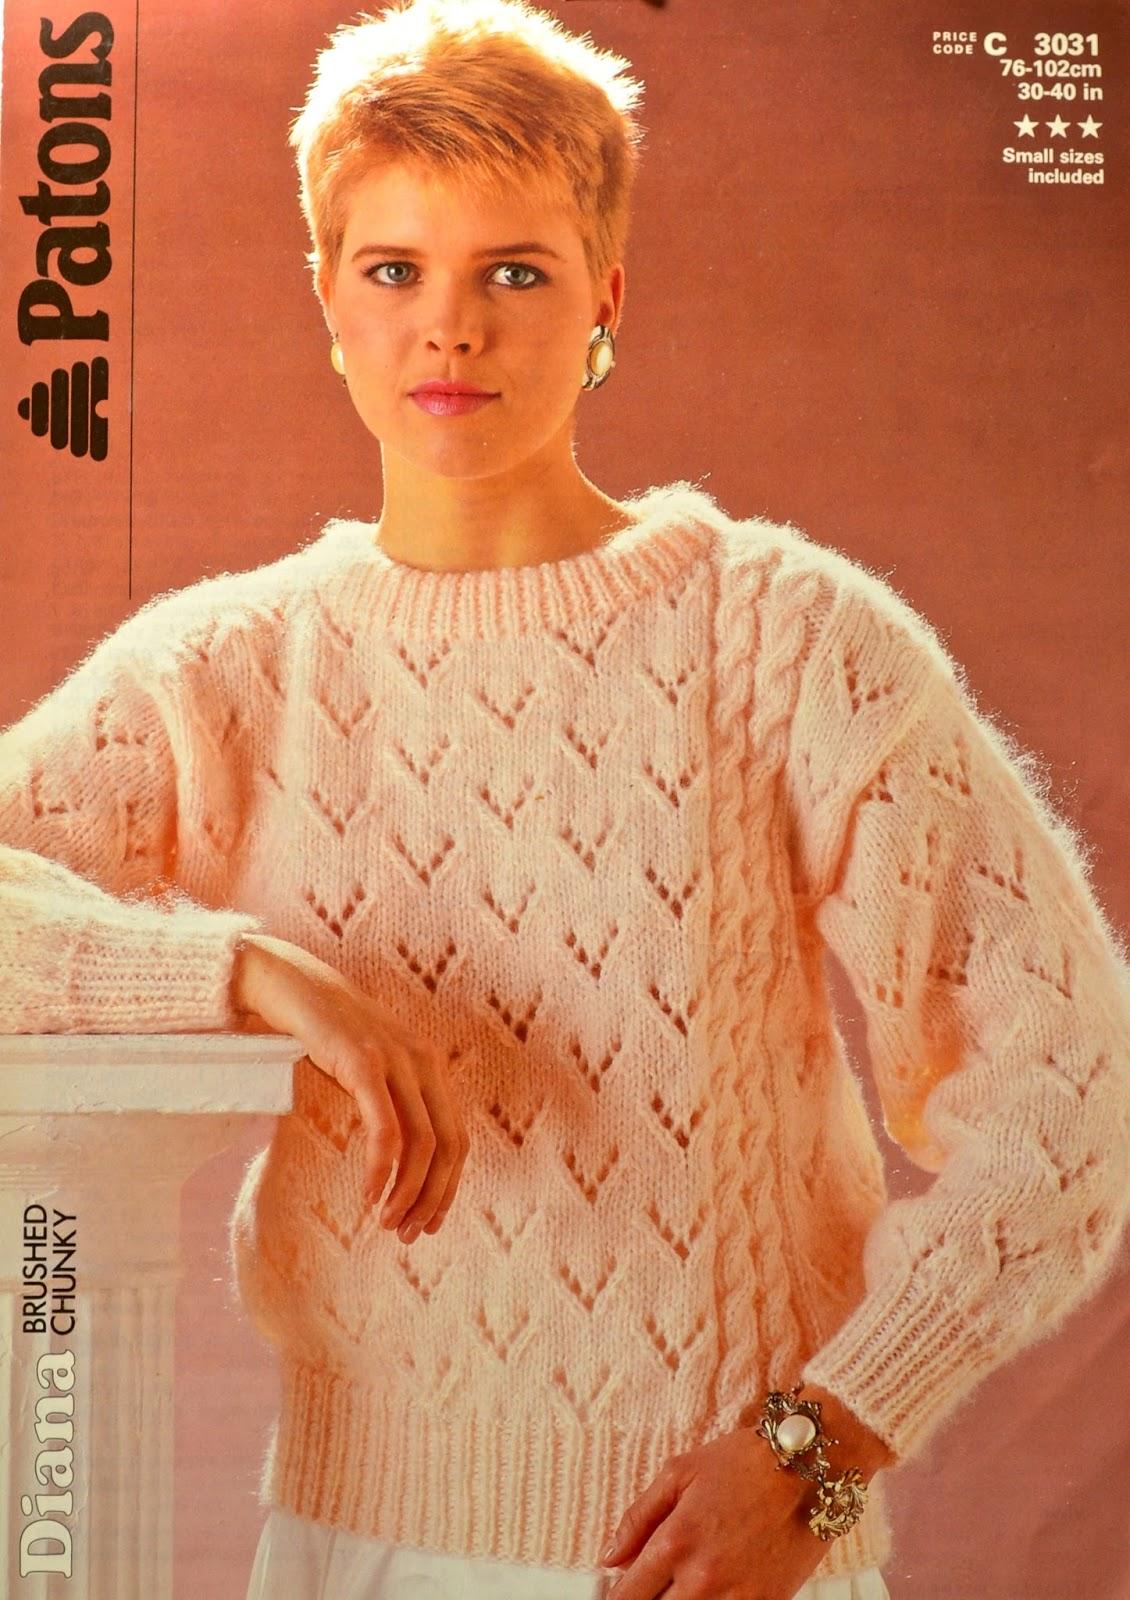 Knitting Novice: Vintage 80s Knitting Patterns - Part 3